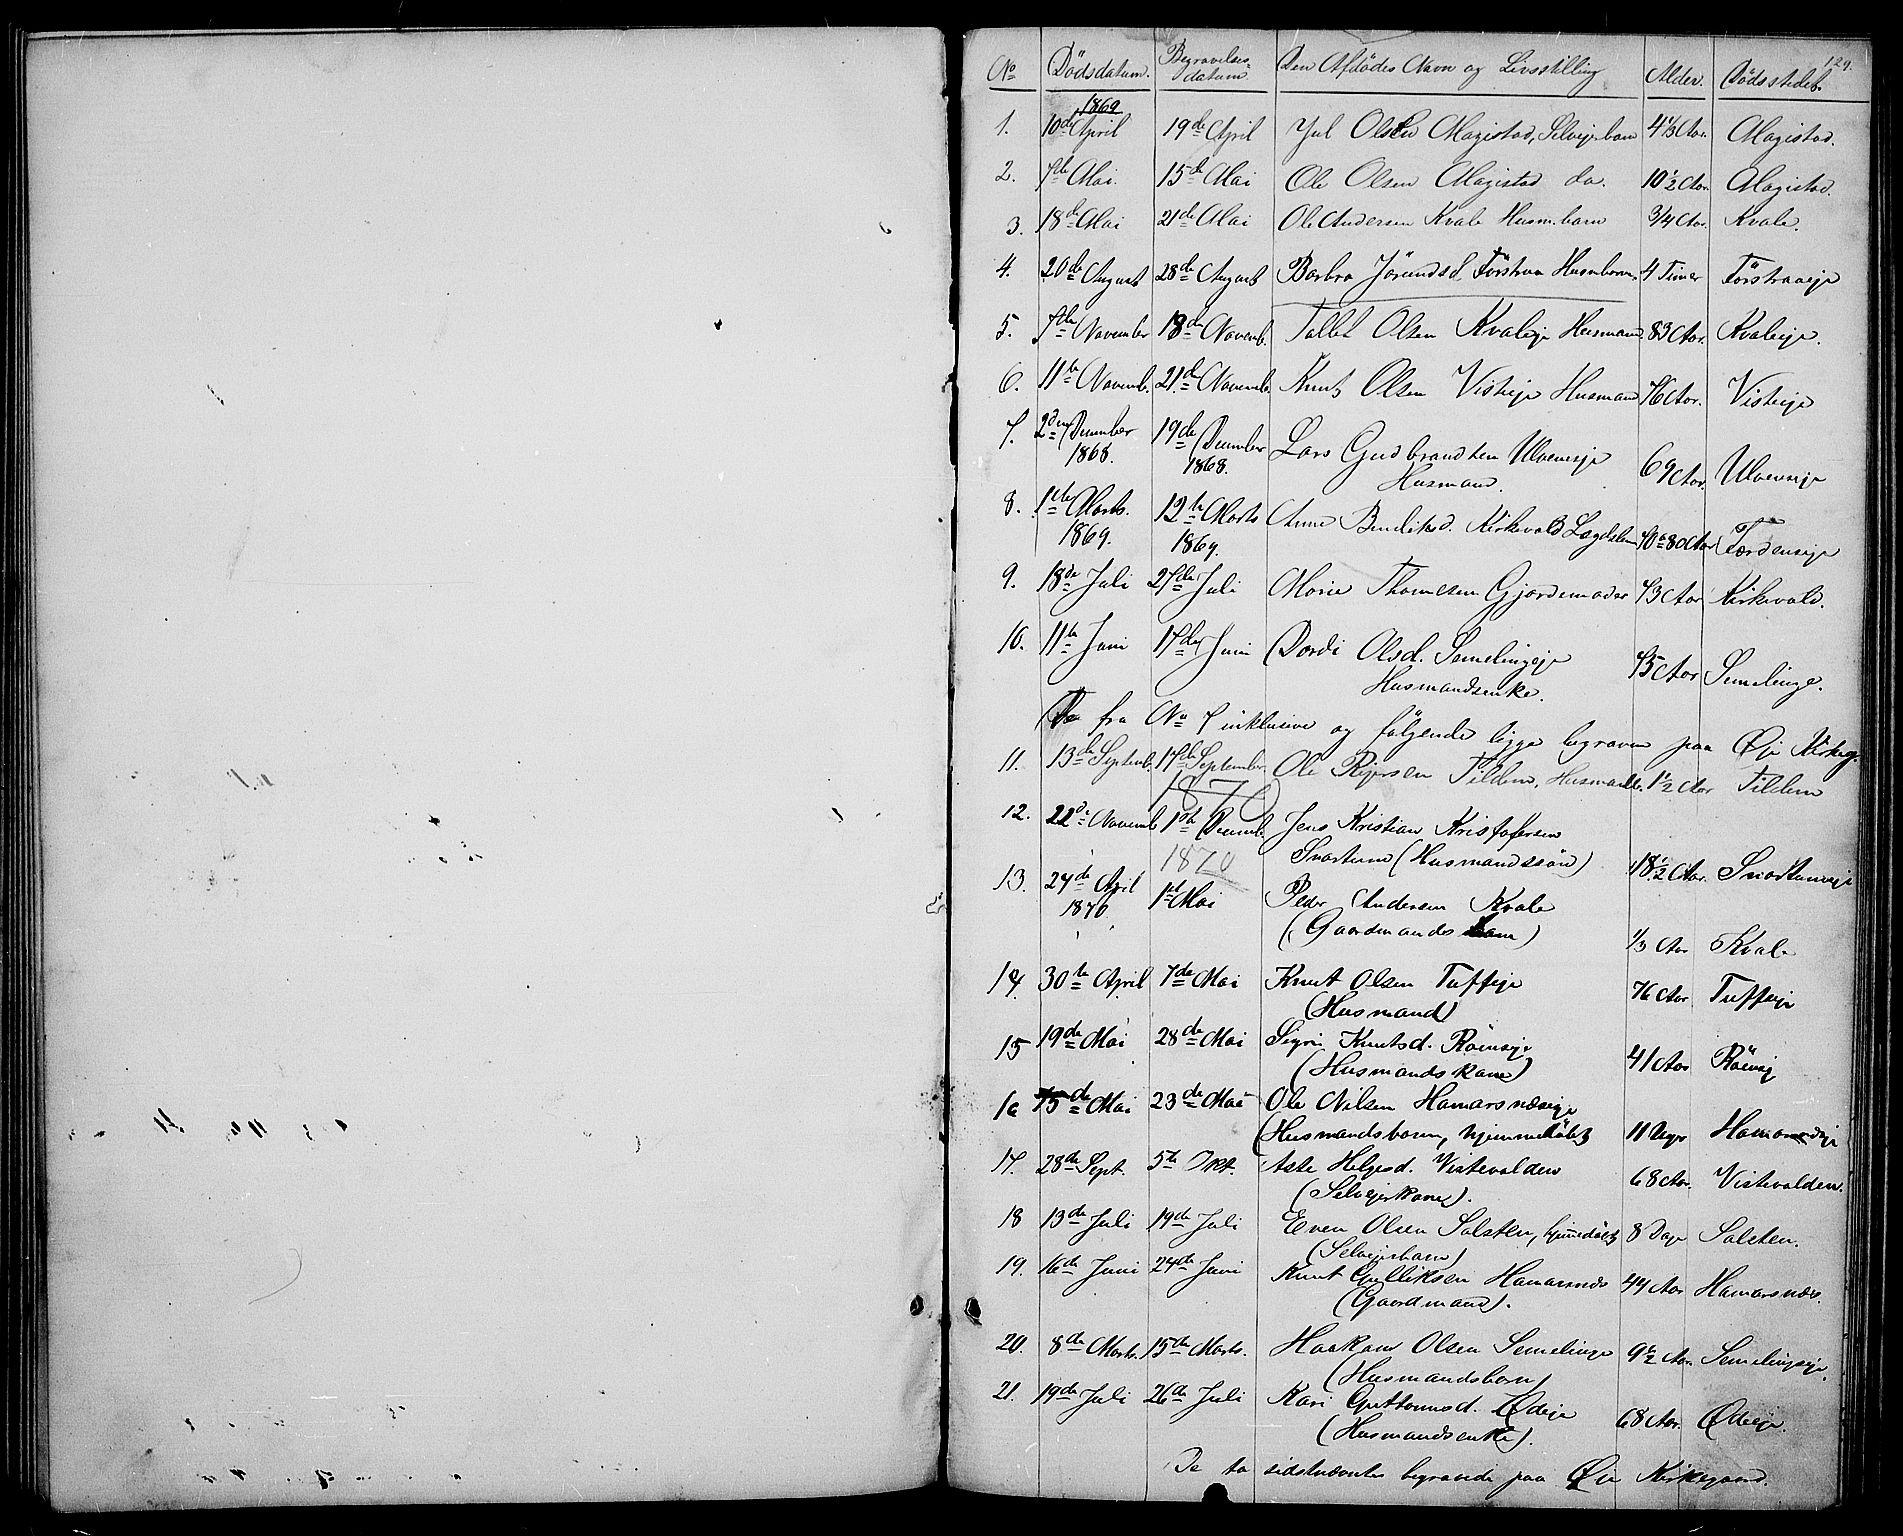 SAH, Vestre Slidre prestekontor, Klokkerbok nr. 3, 1869-1882, s. 129